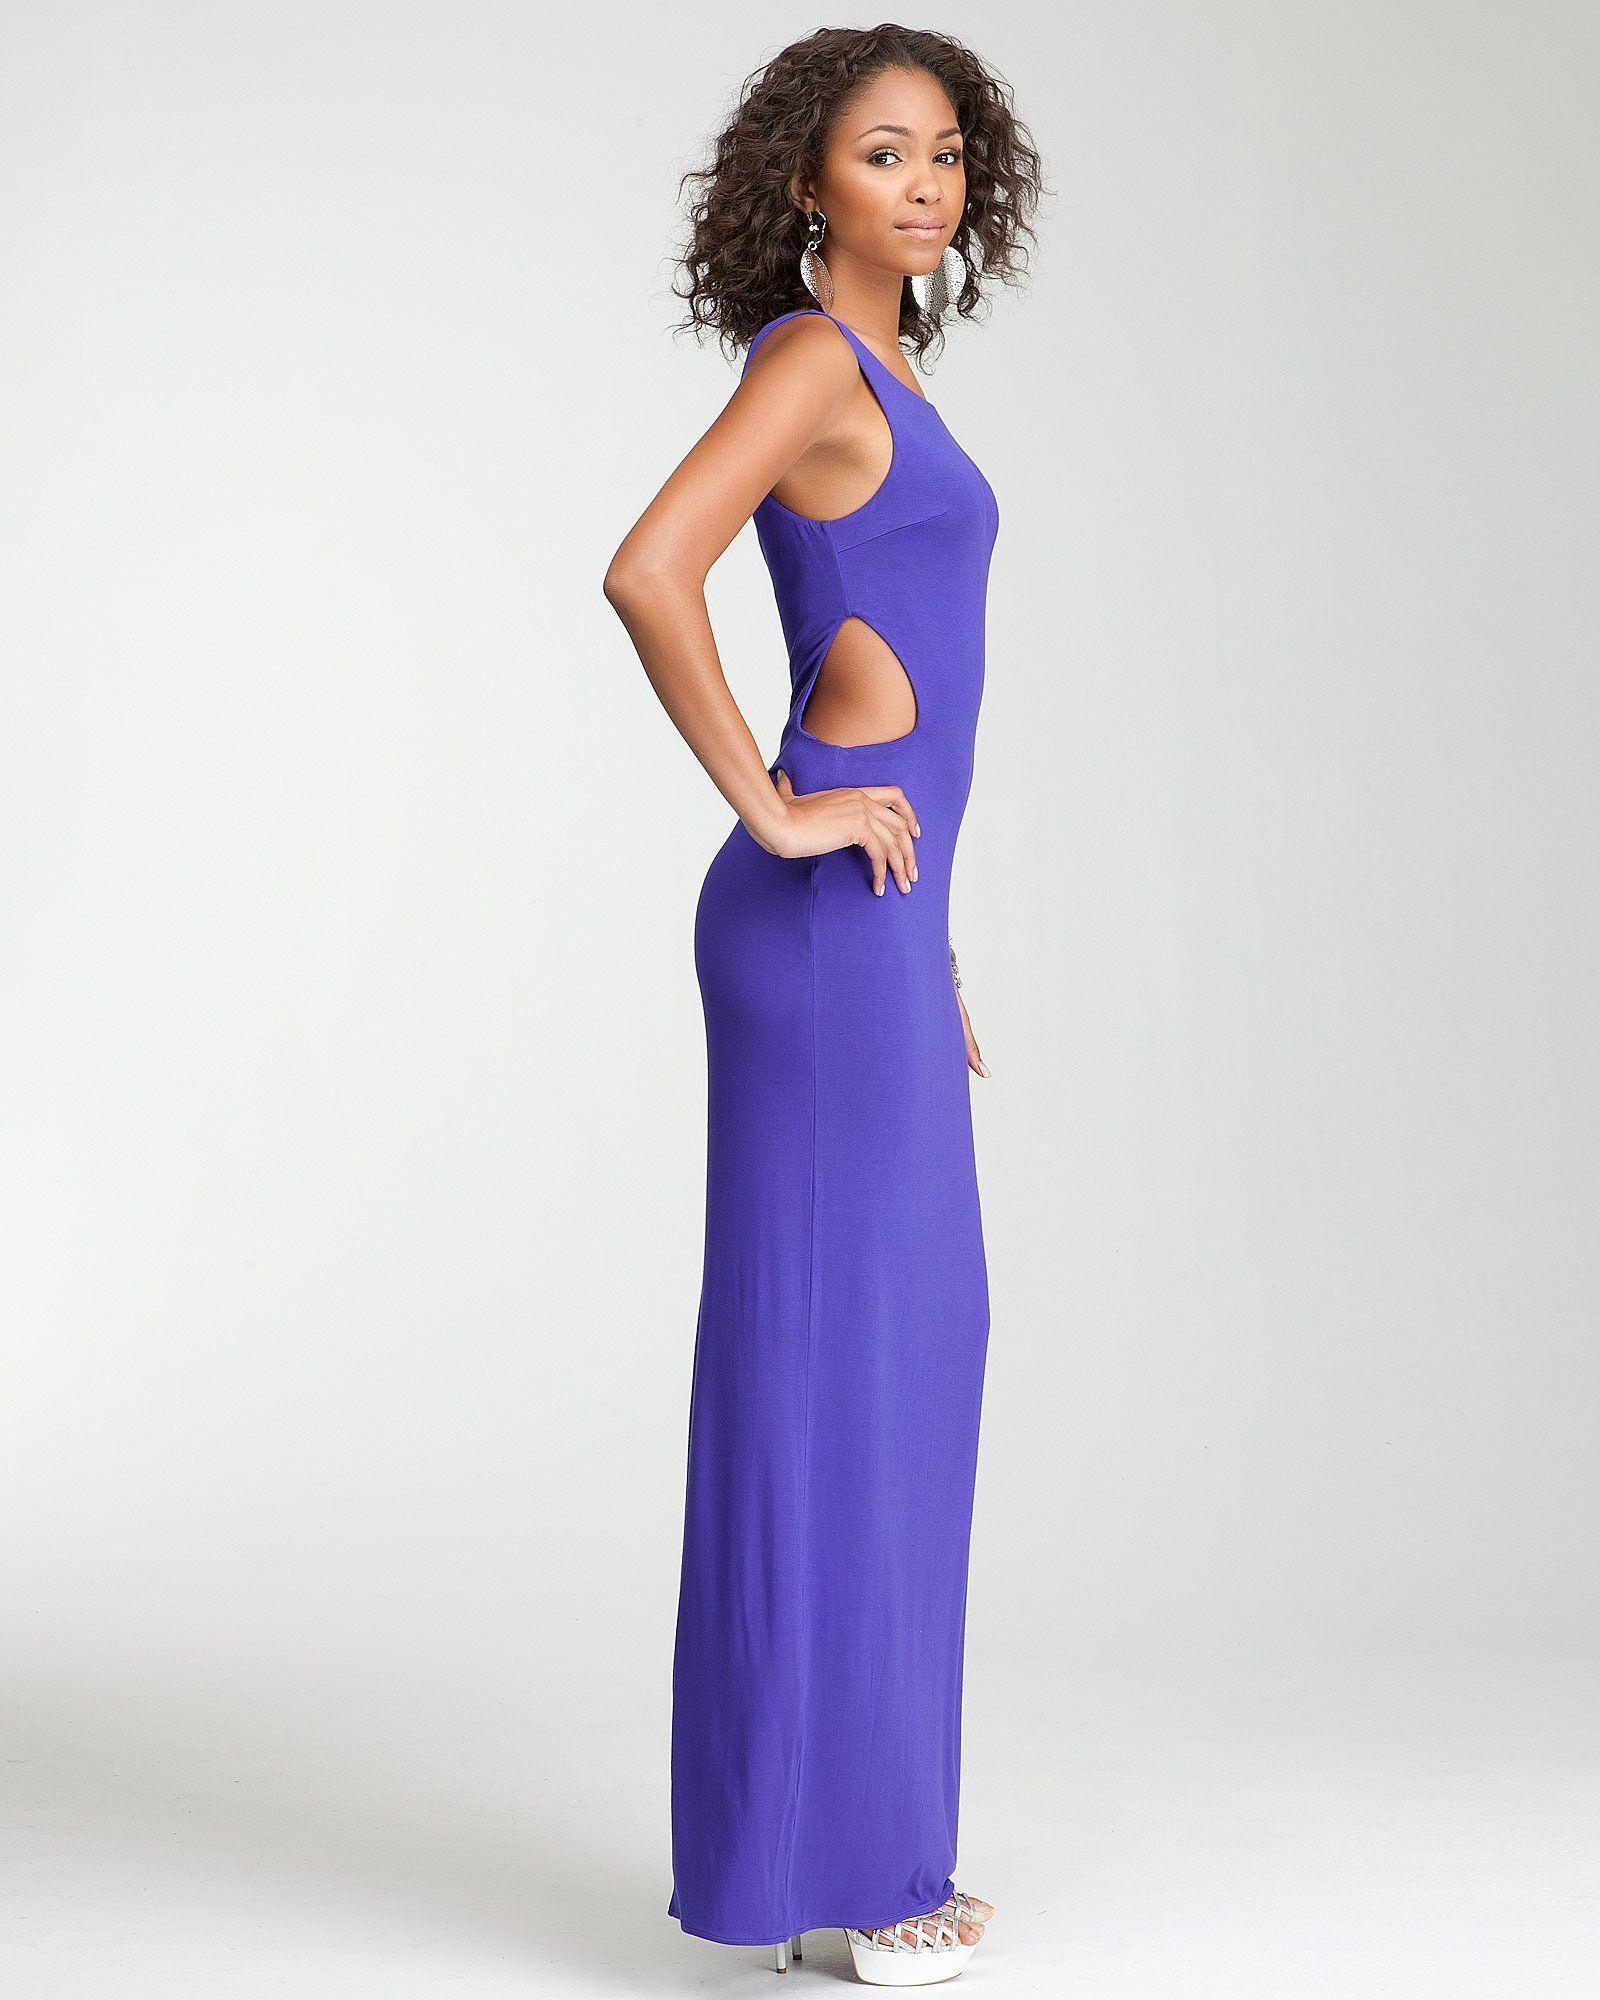 Bebe sleeveless side cutout maxi dress wanderlust pinterest